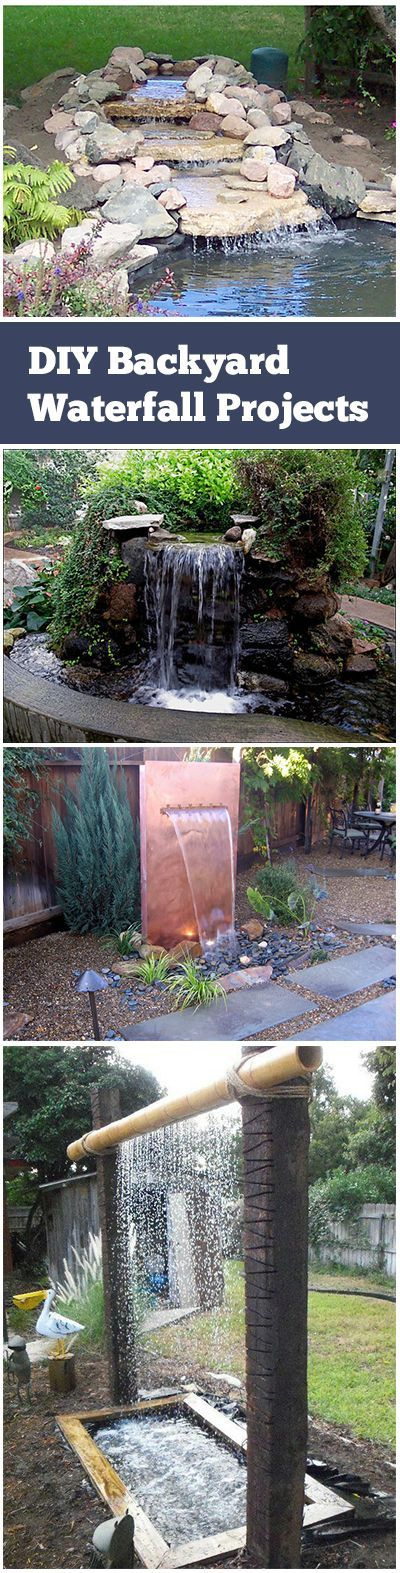 DIY Backyard Waterfall Projects WHAT NO WAY